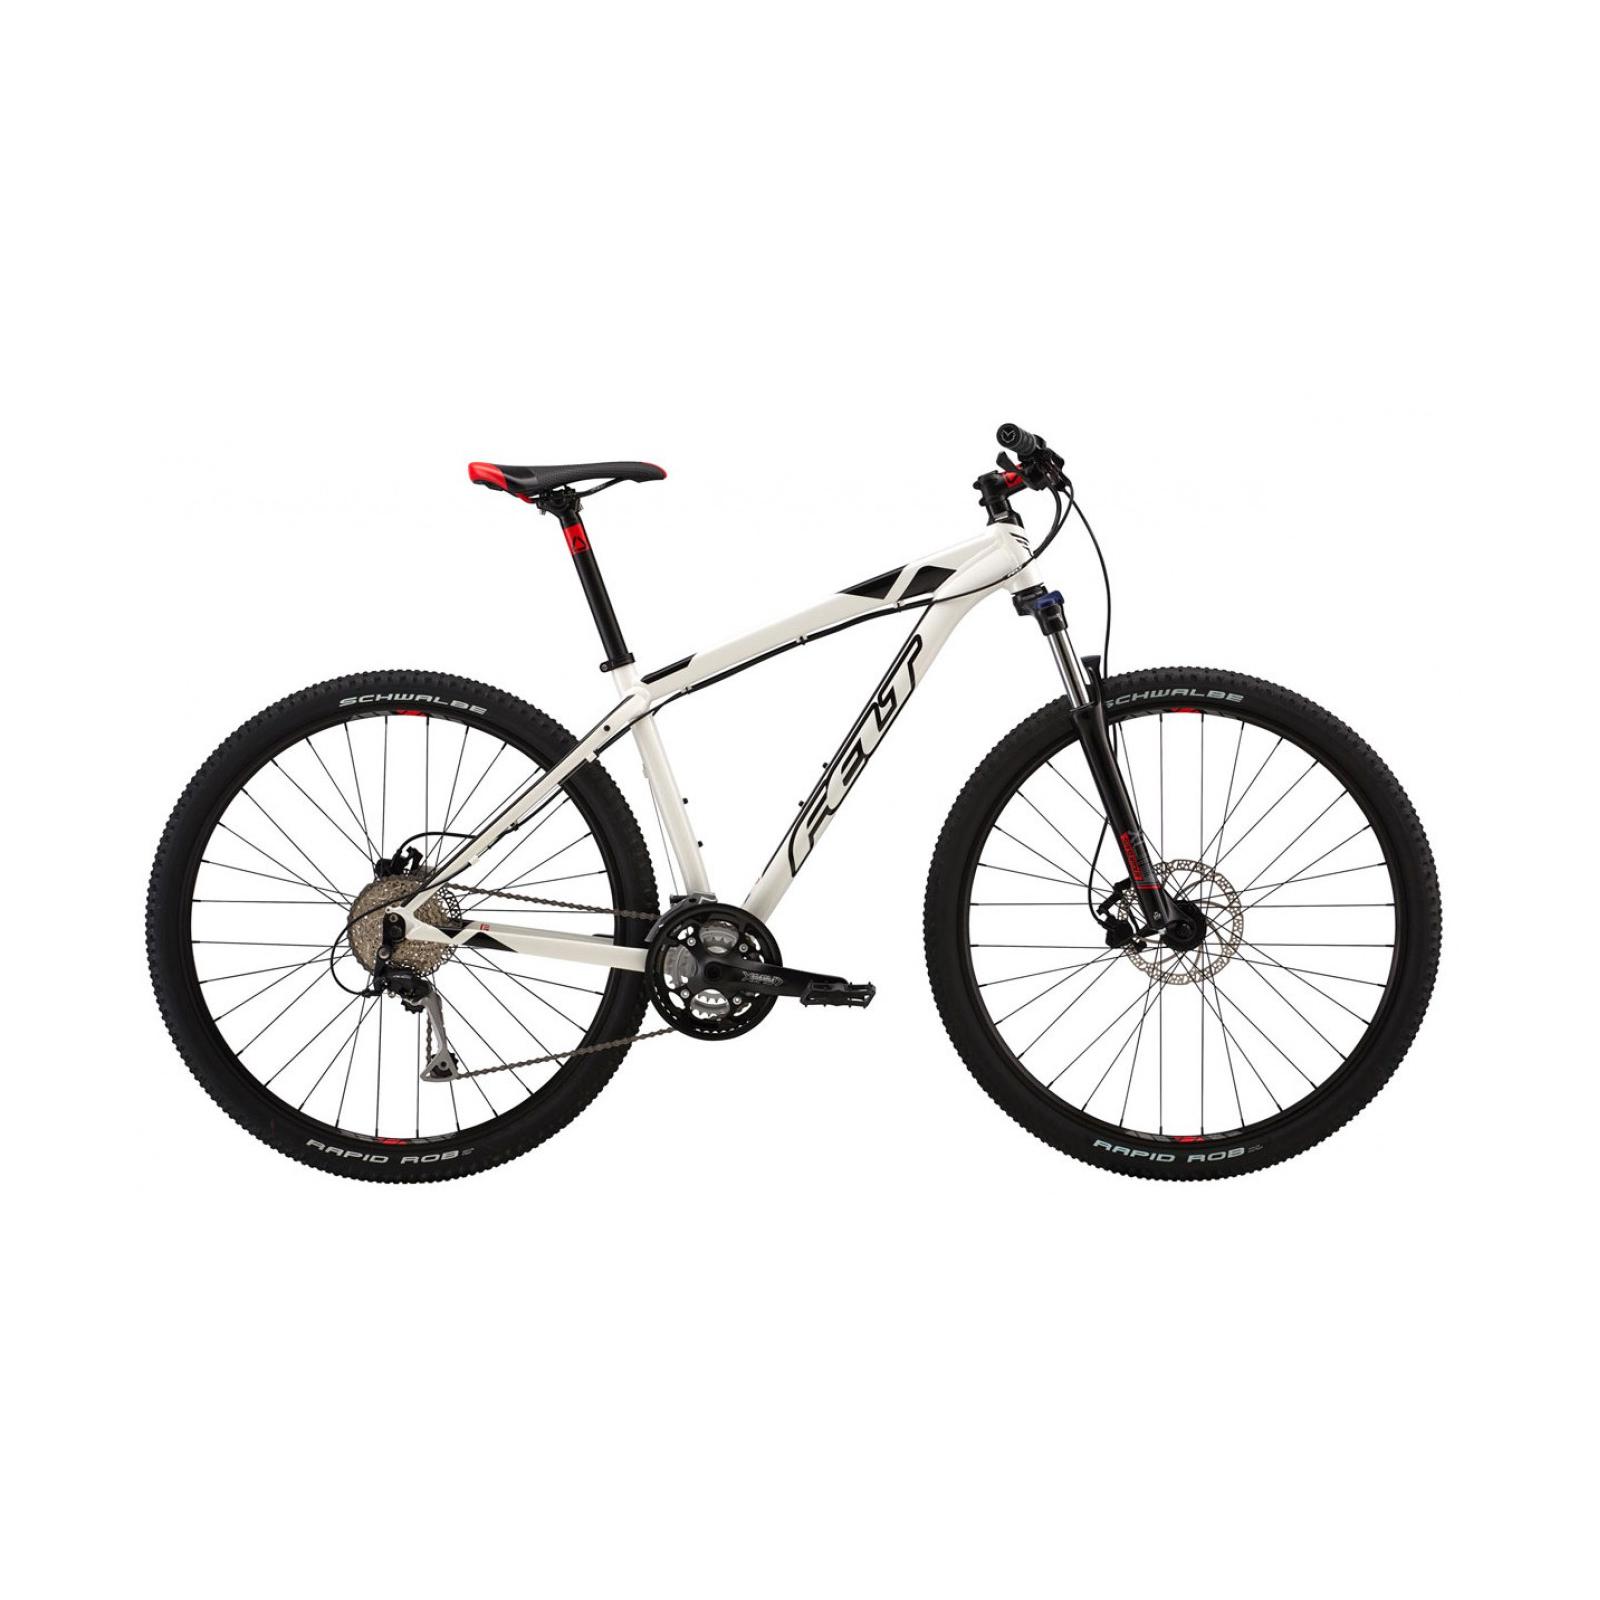 "Велосипед Felt 2016 MTB NINE 70 XL gloss white 22"" 58cm (8064 66902)"